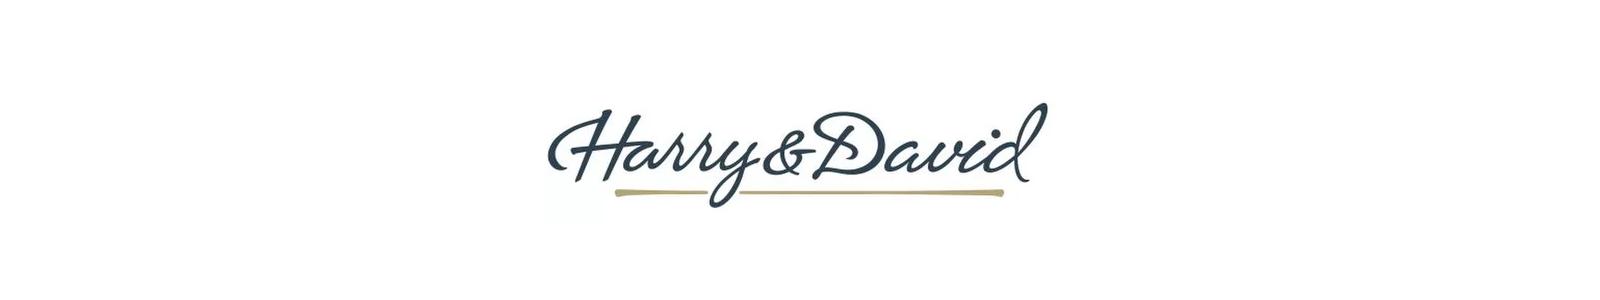 Harry and David - Case Study